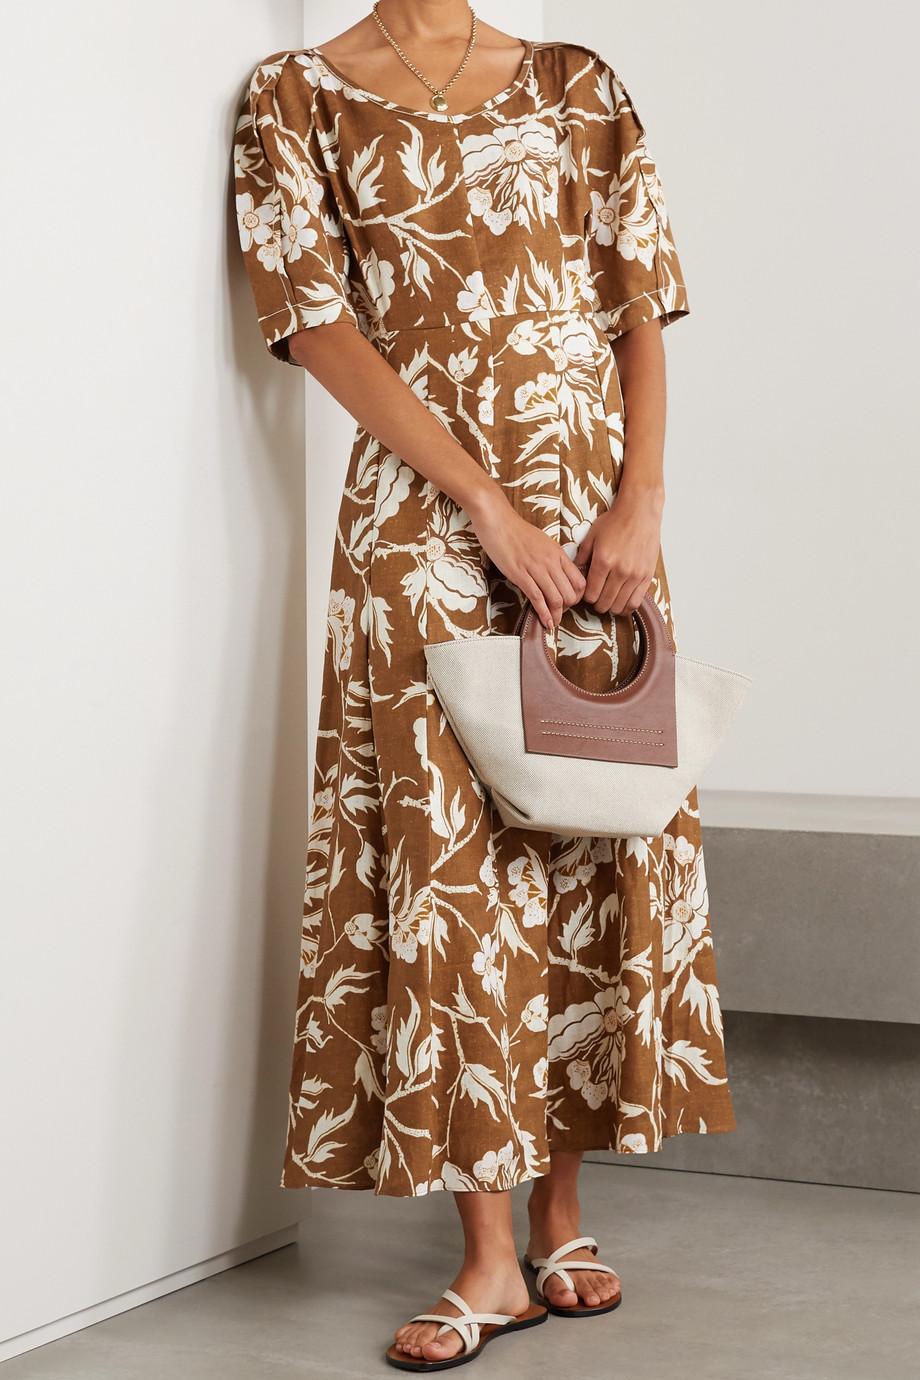 Mara Hoffman + NET SUSTAIN Sicily Midikleid aus Hanf mit Blumenprint